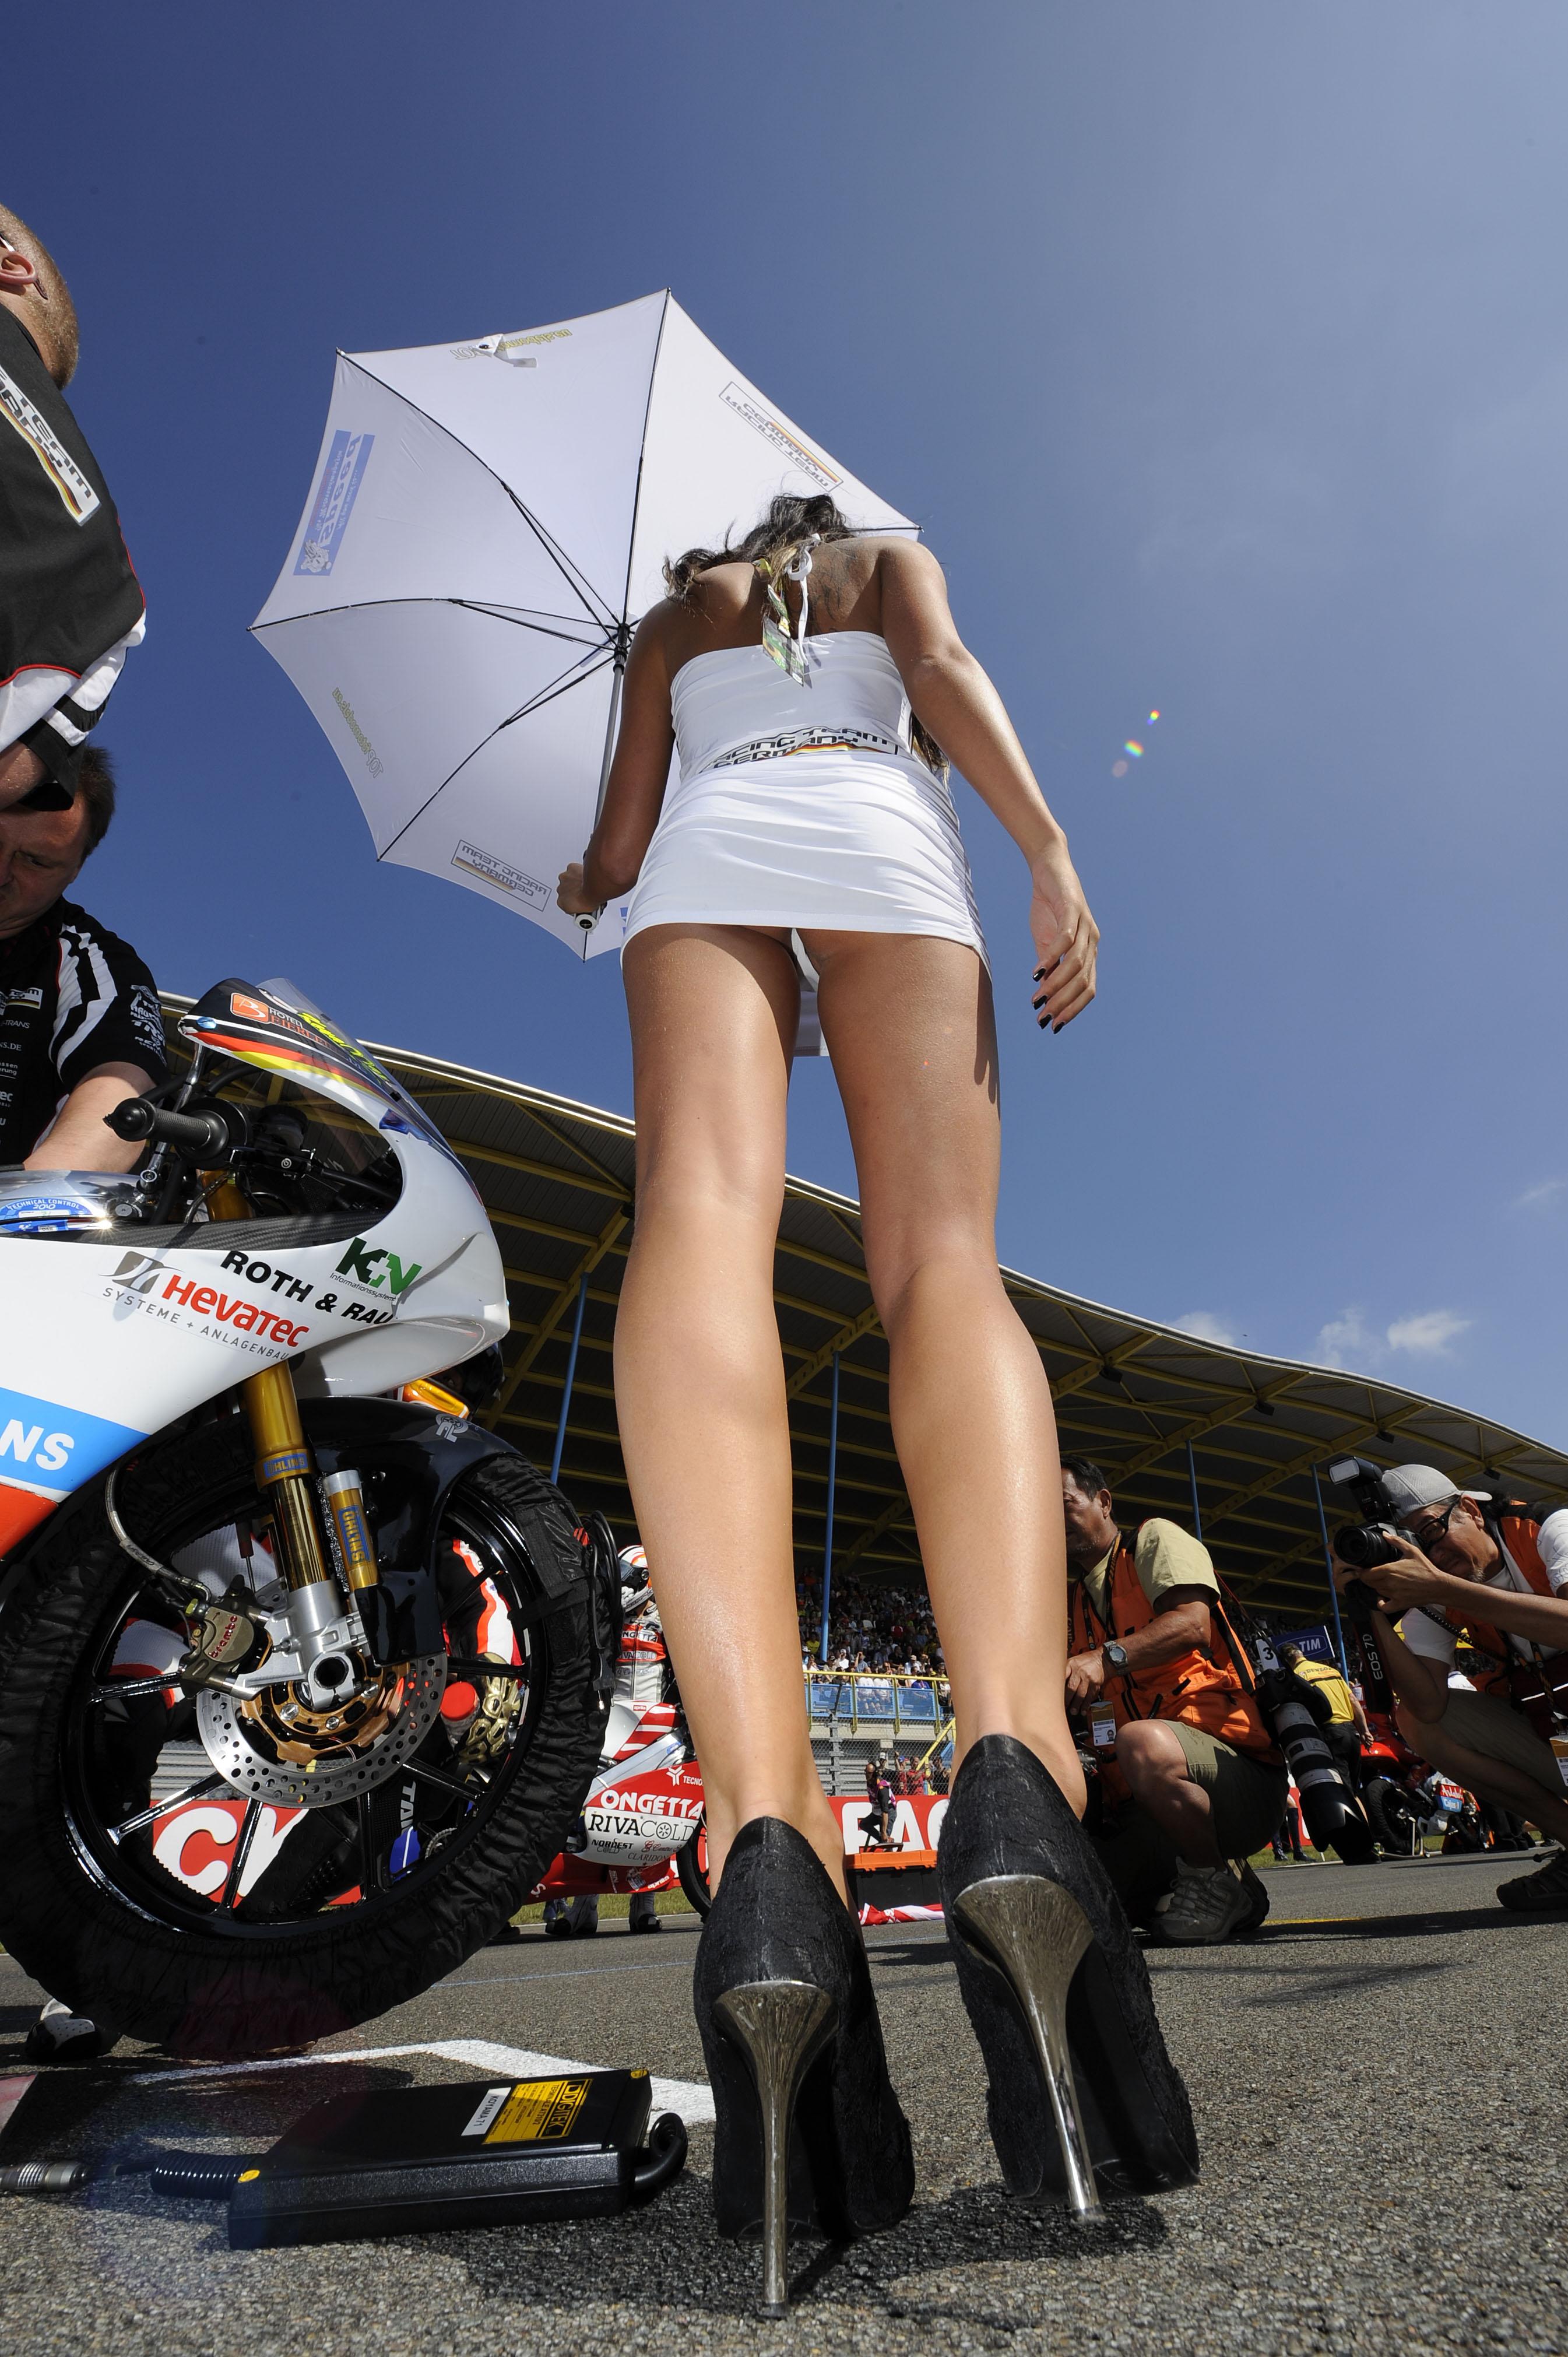 Motor racing girls tight thong leggings - 2 7